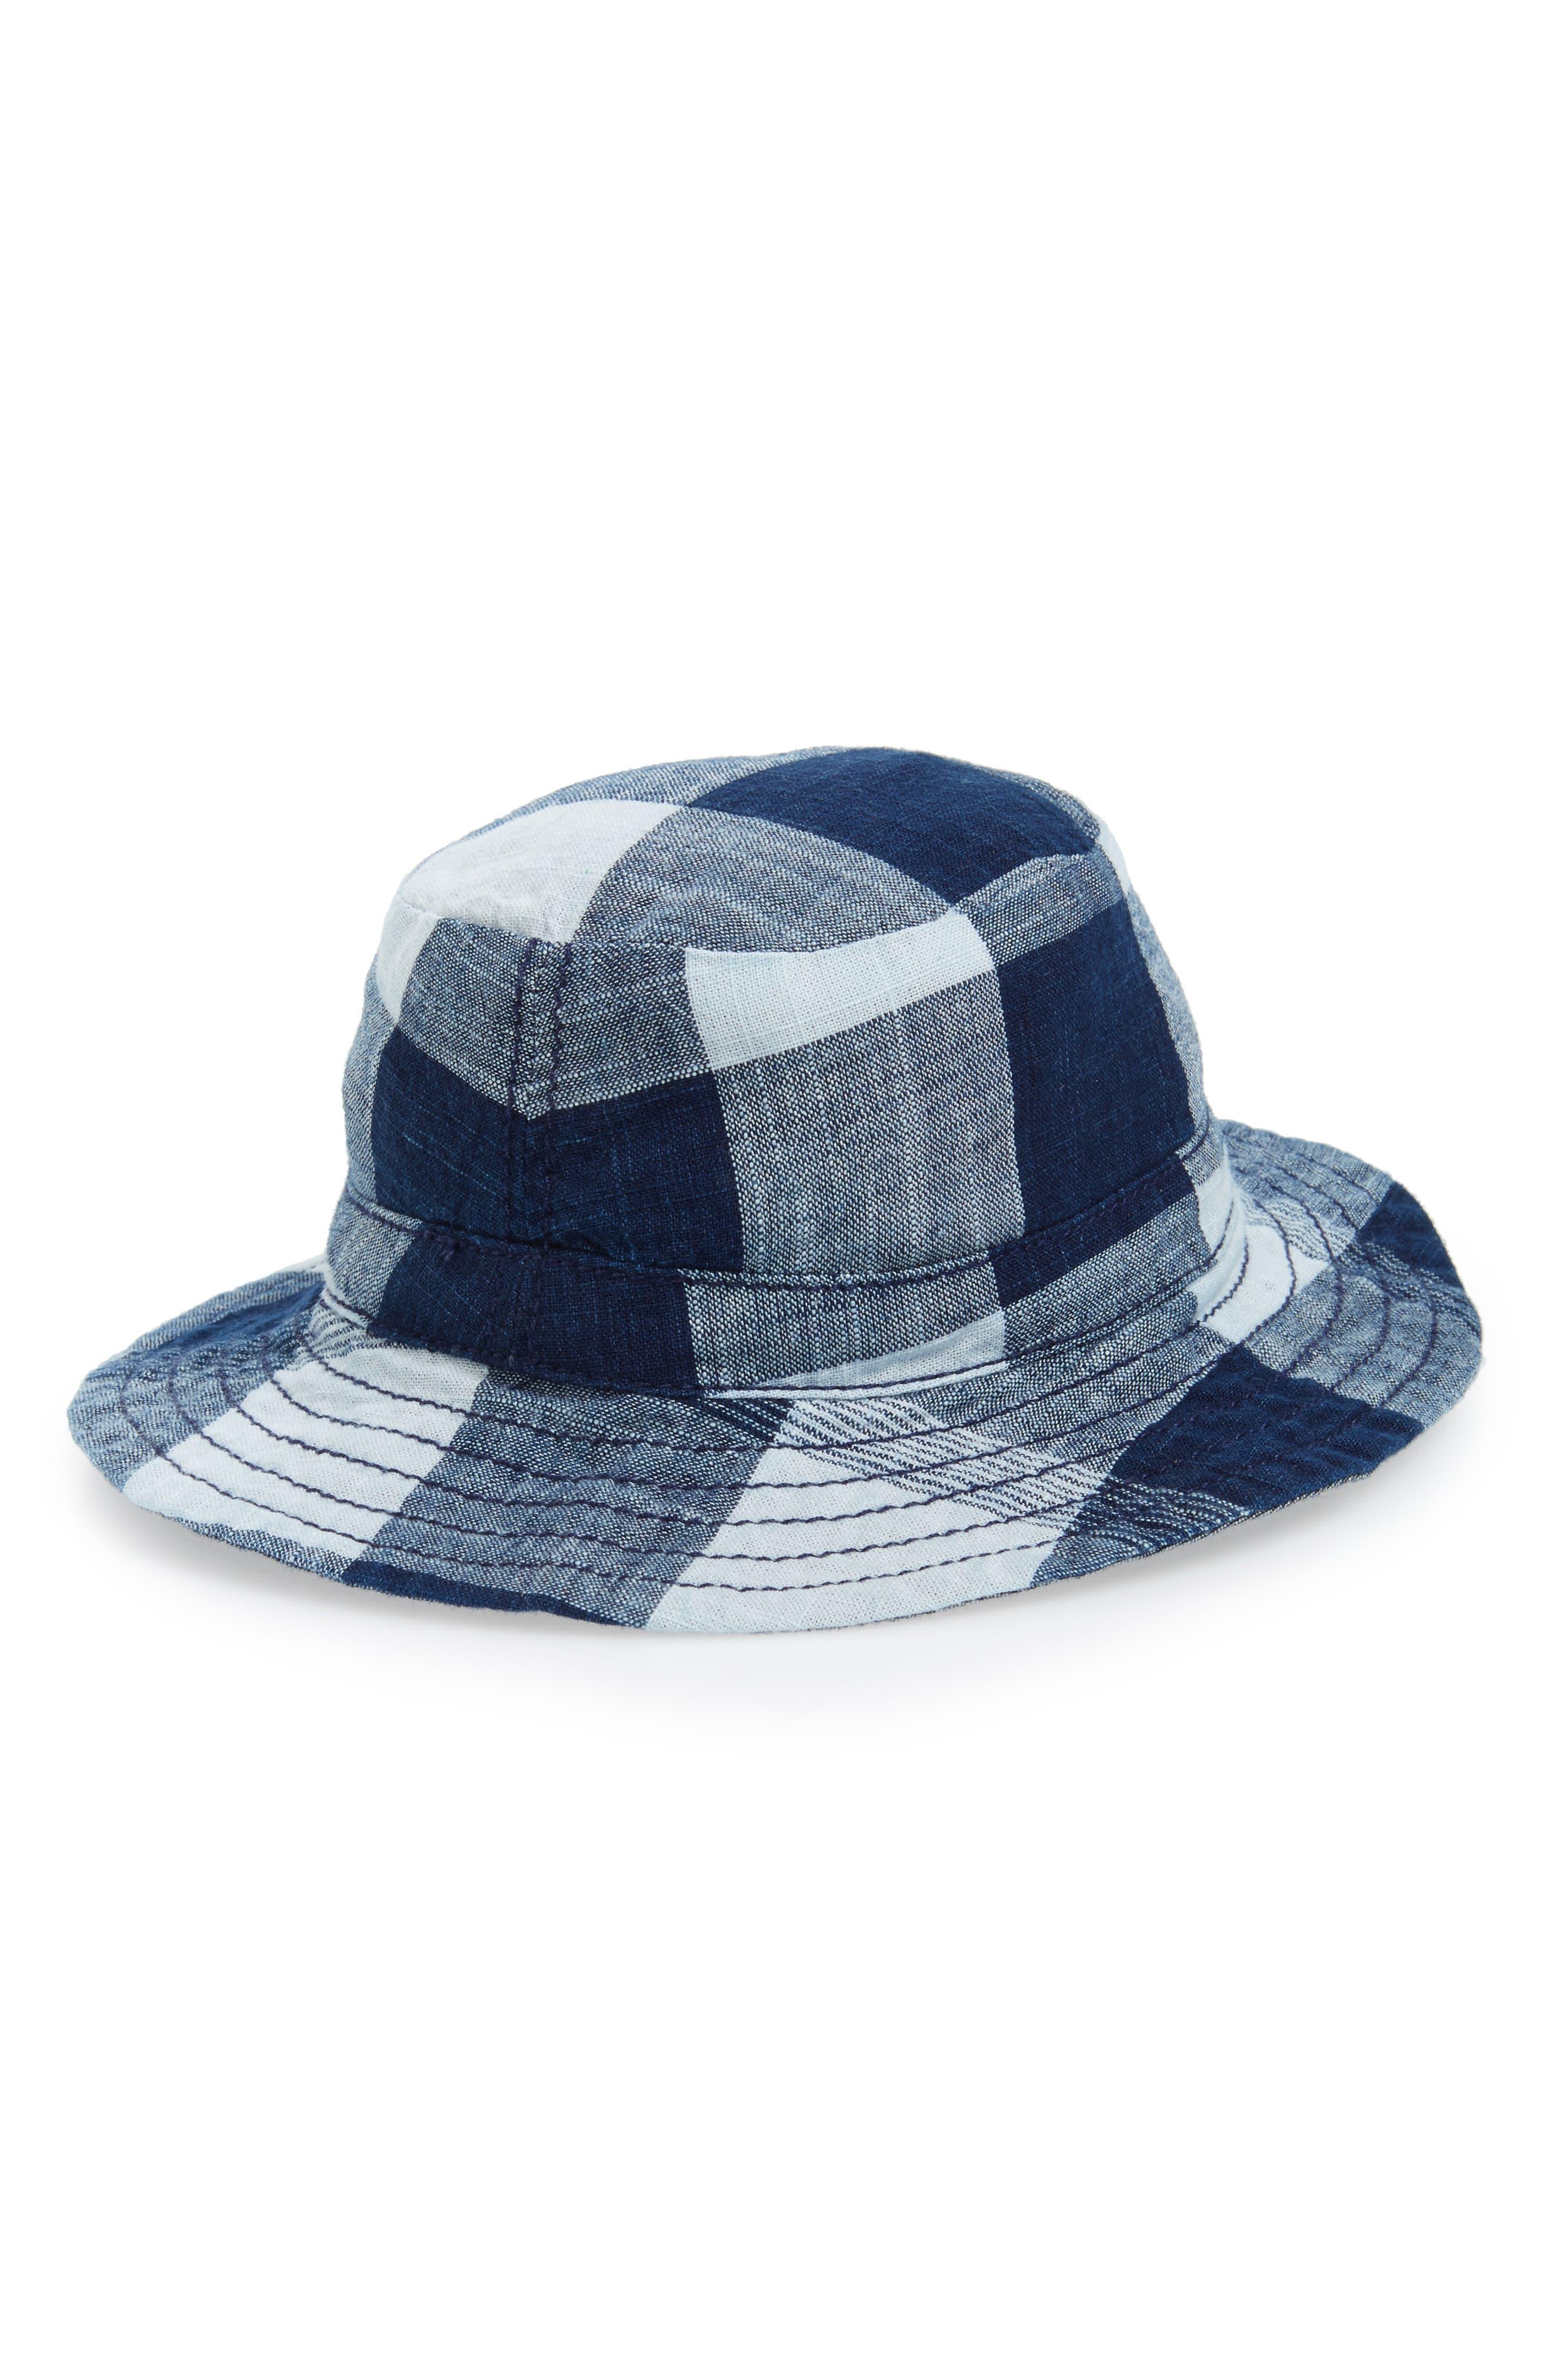 Reversible Bucket Hat,                         Main,                         color, 401